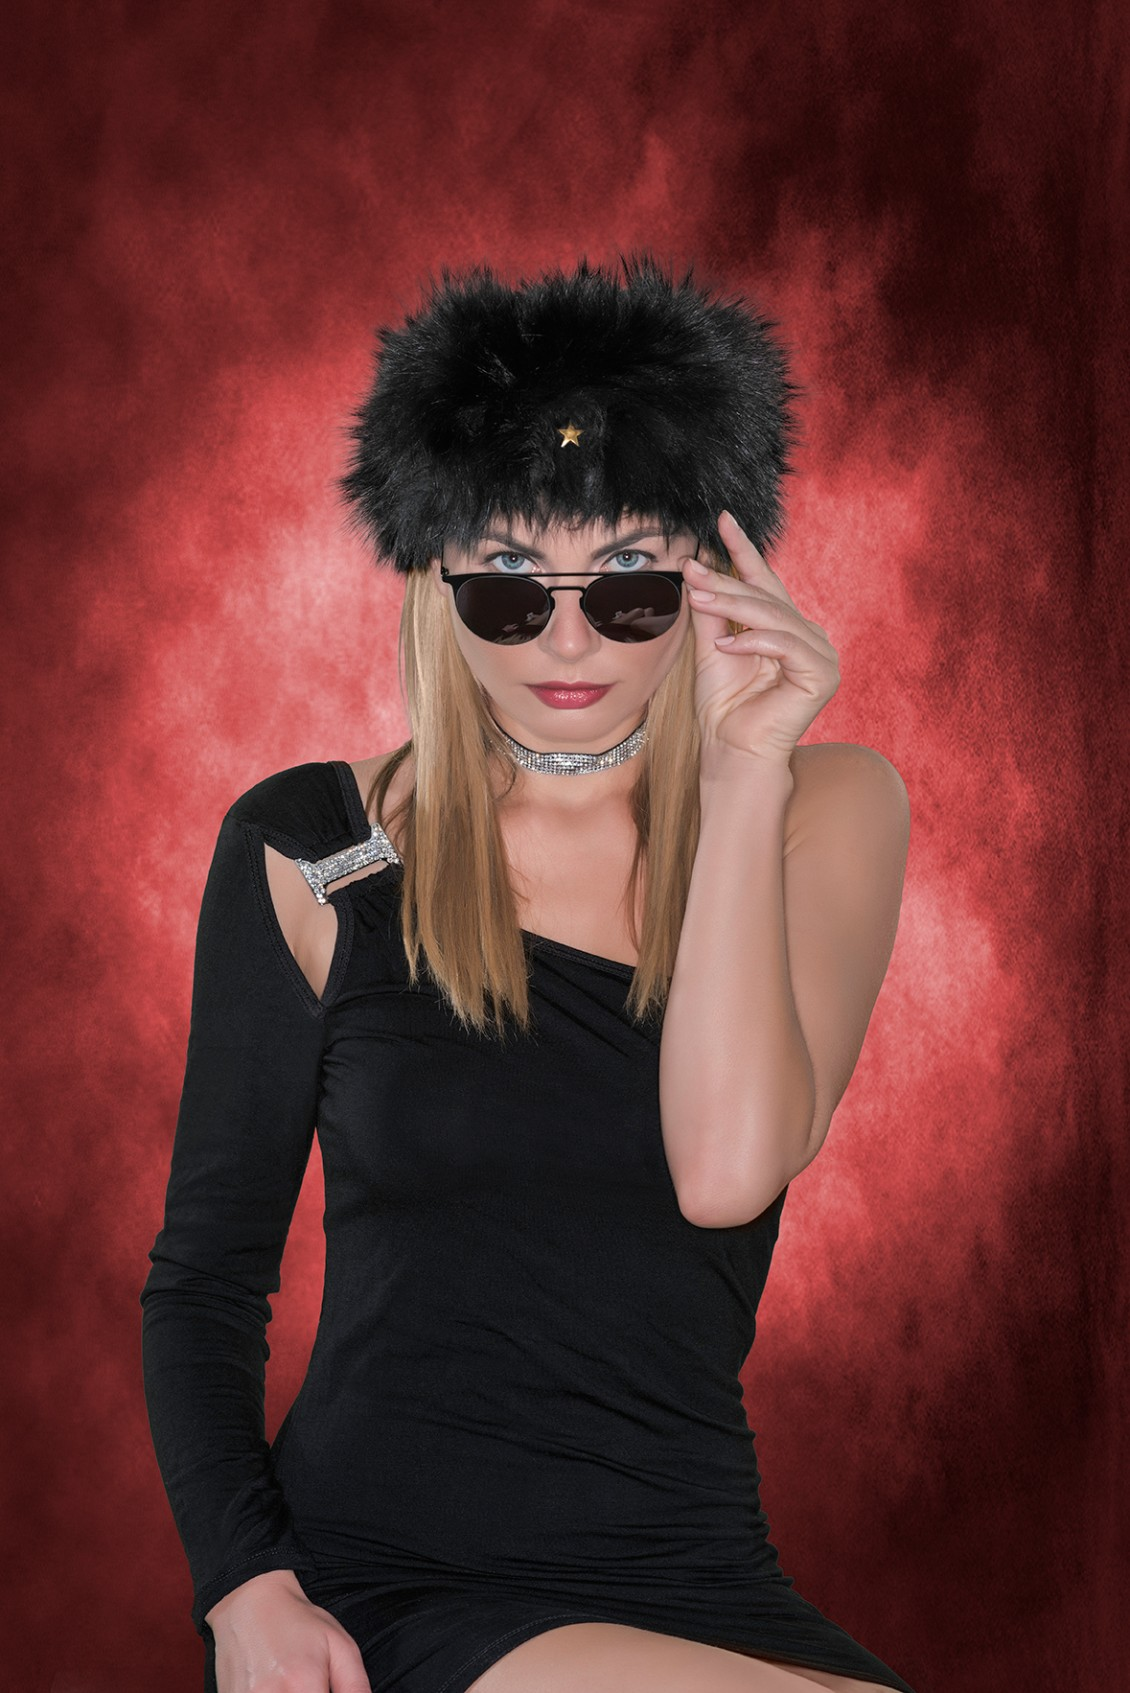 Russian_Woman_RGB_Screen